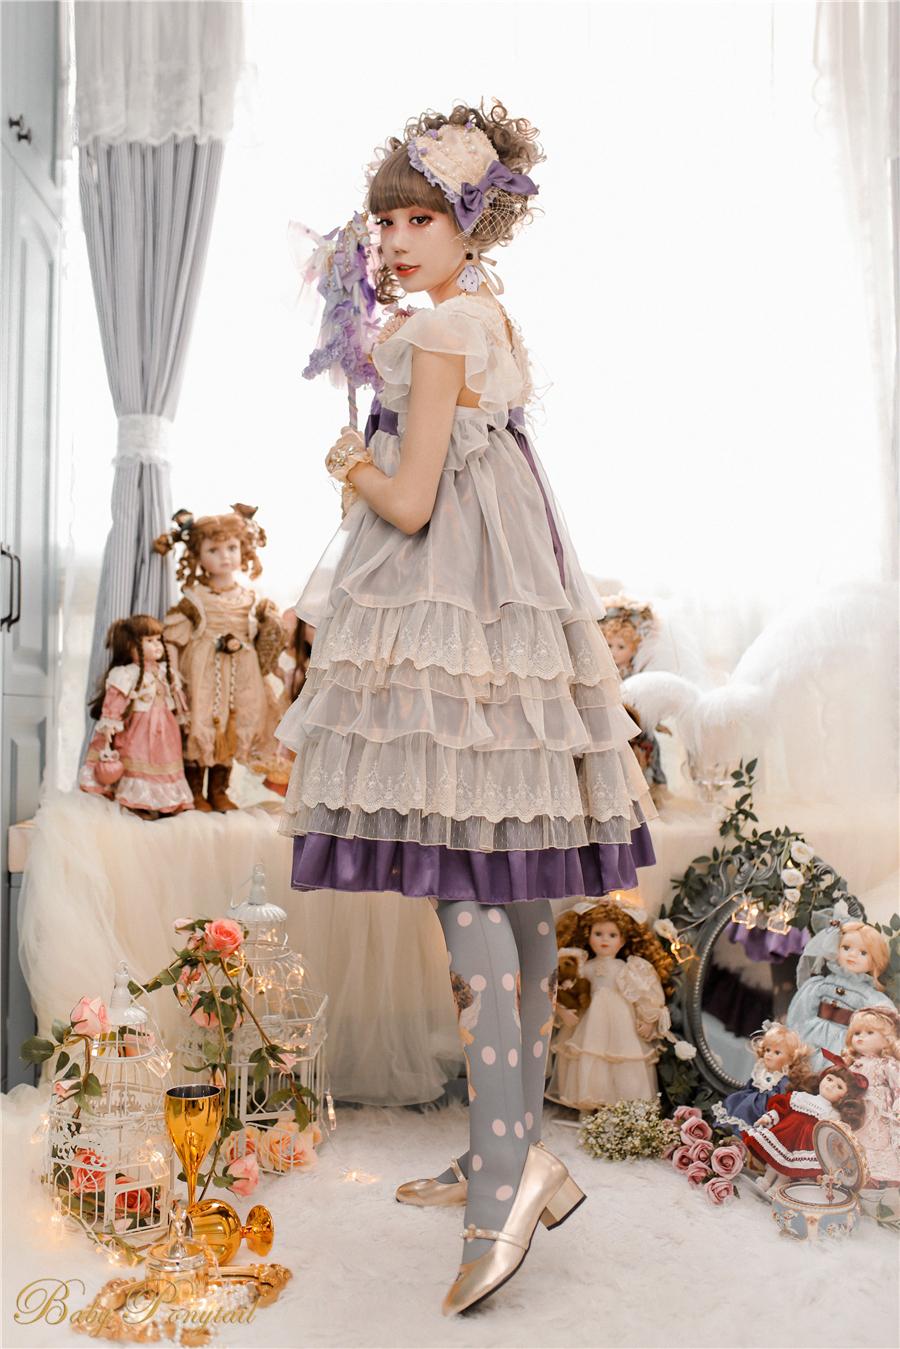 Babyponytail_Model Photo_Present Angel_JSK Violet_2_Kaka_03.jpg